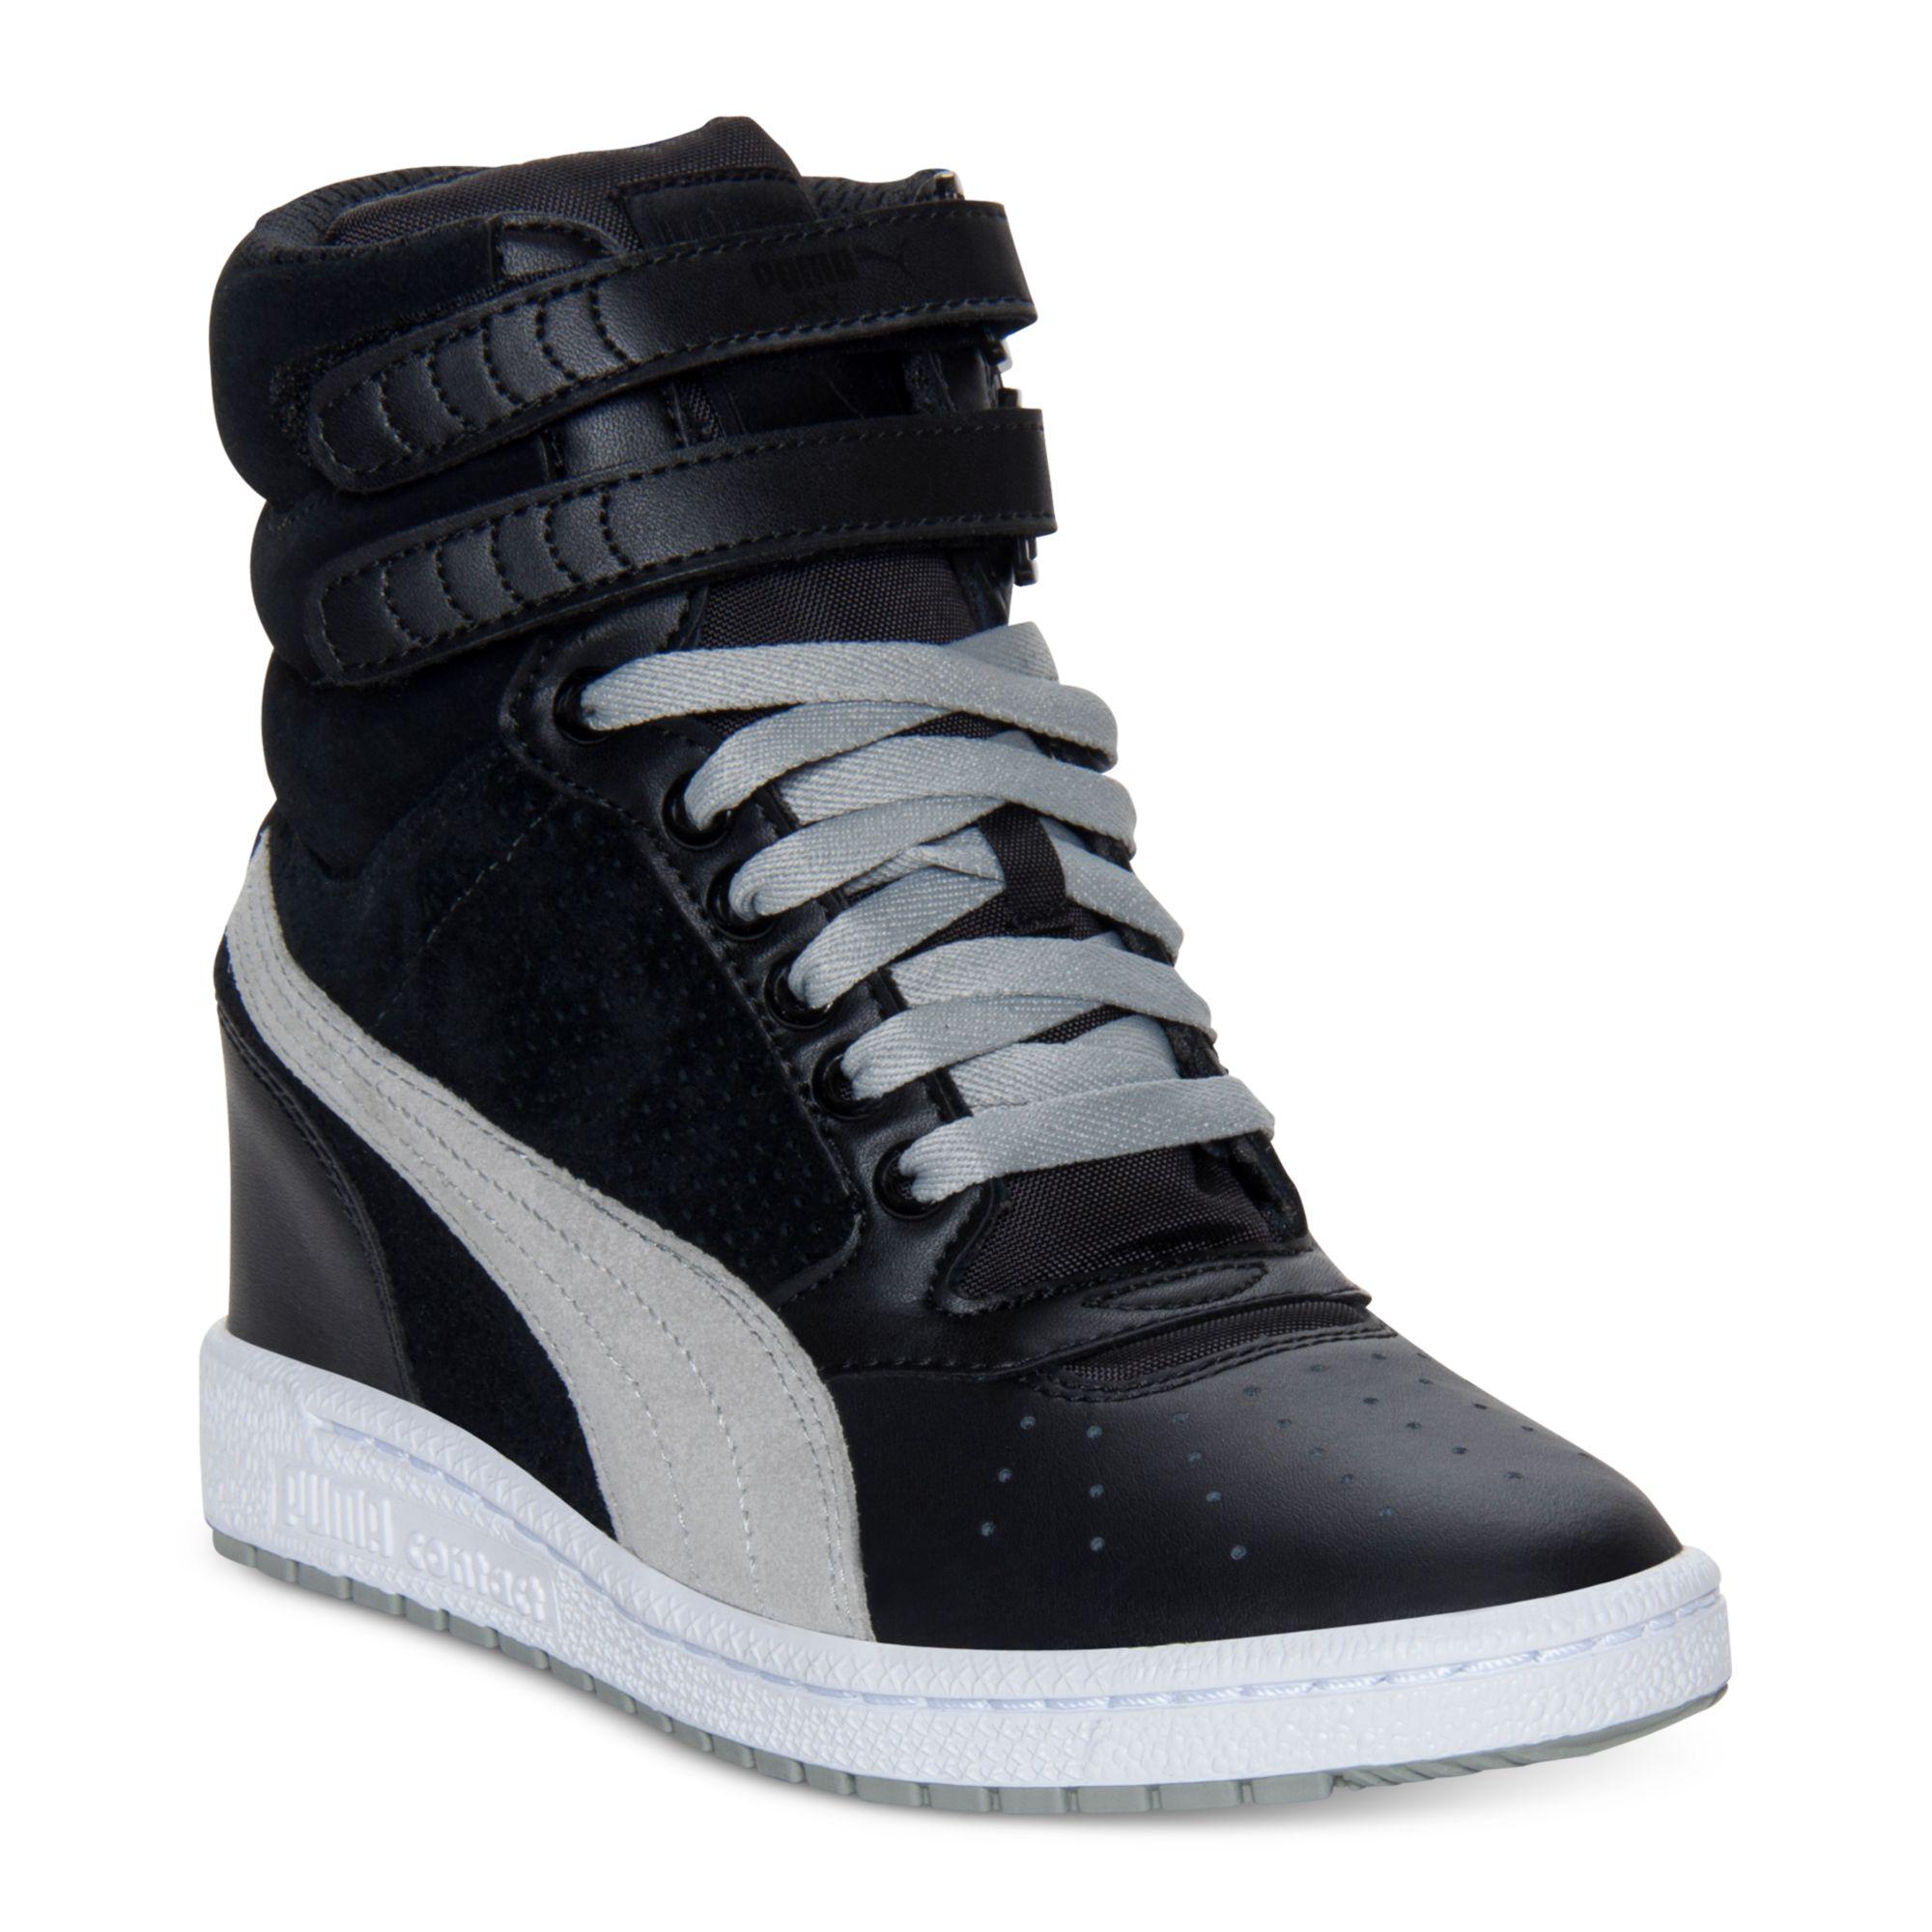 83d638c6b2f Lyst - PUMA Sky Wedge Casual Sneakers in Black